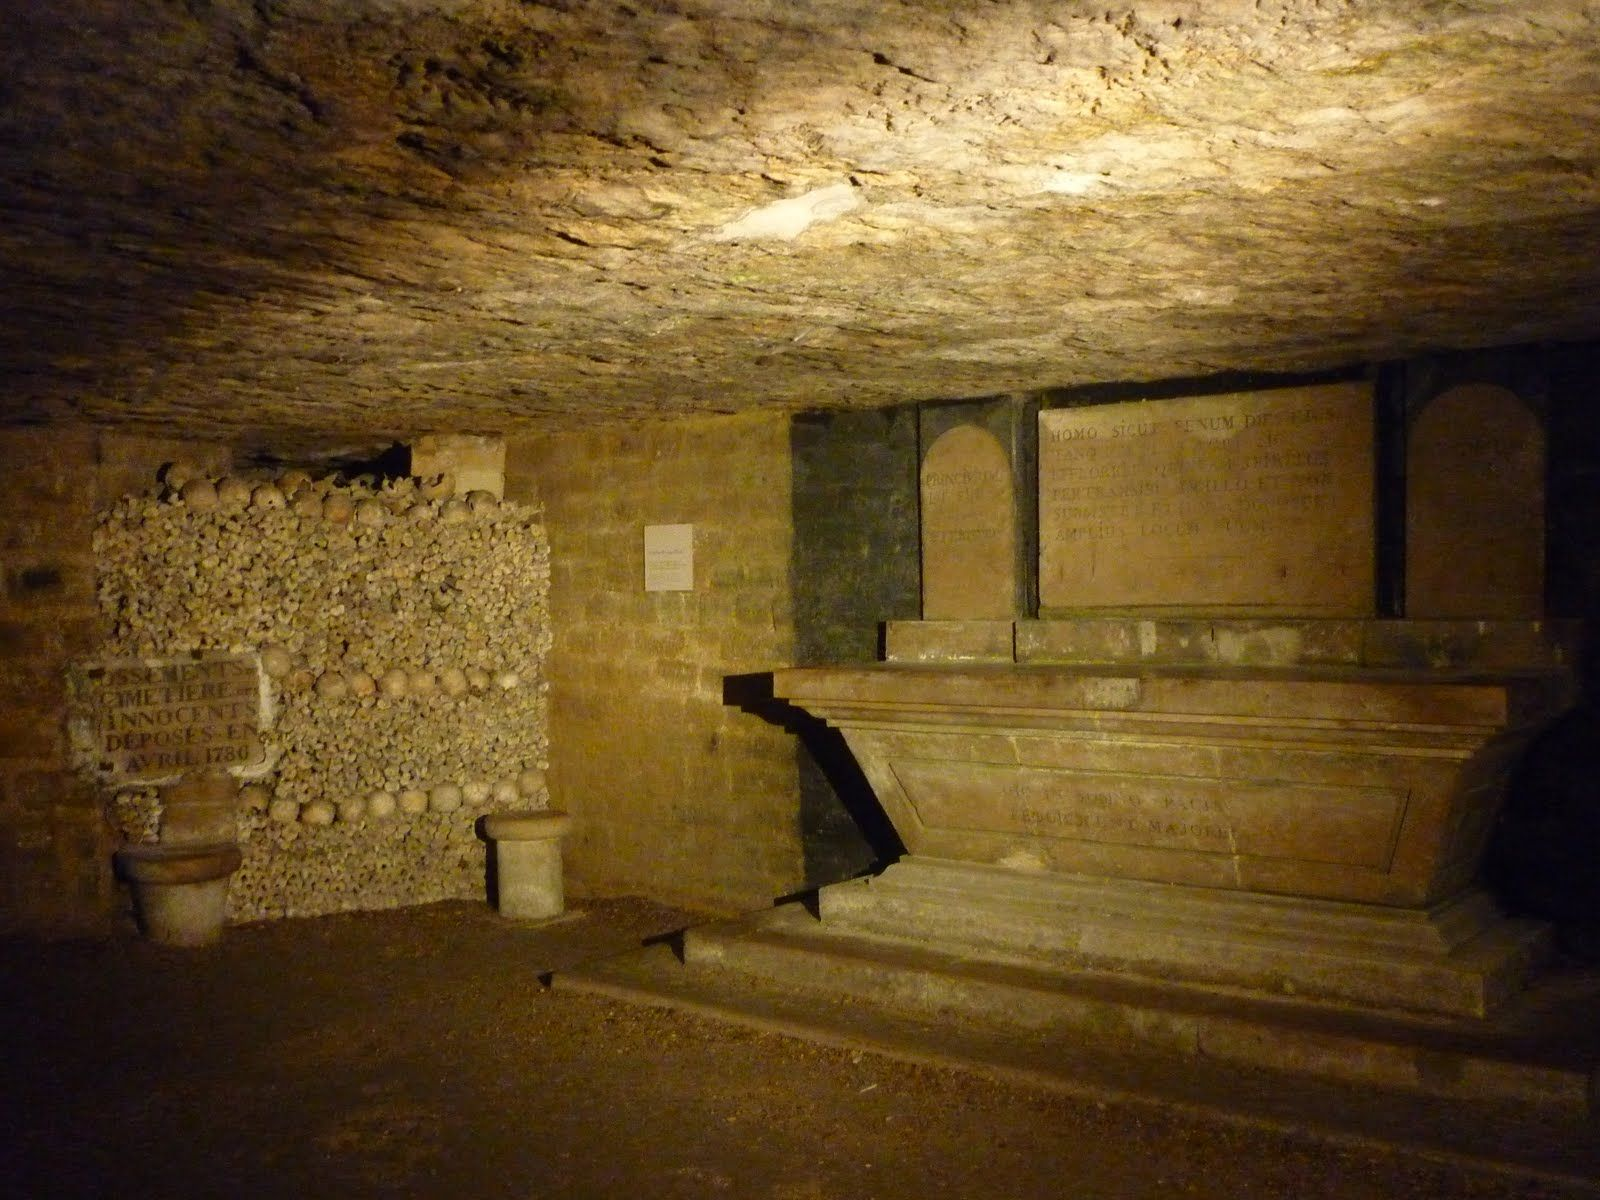 Crypte Catacombes Paris 画像あり